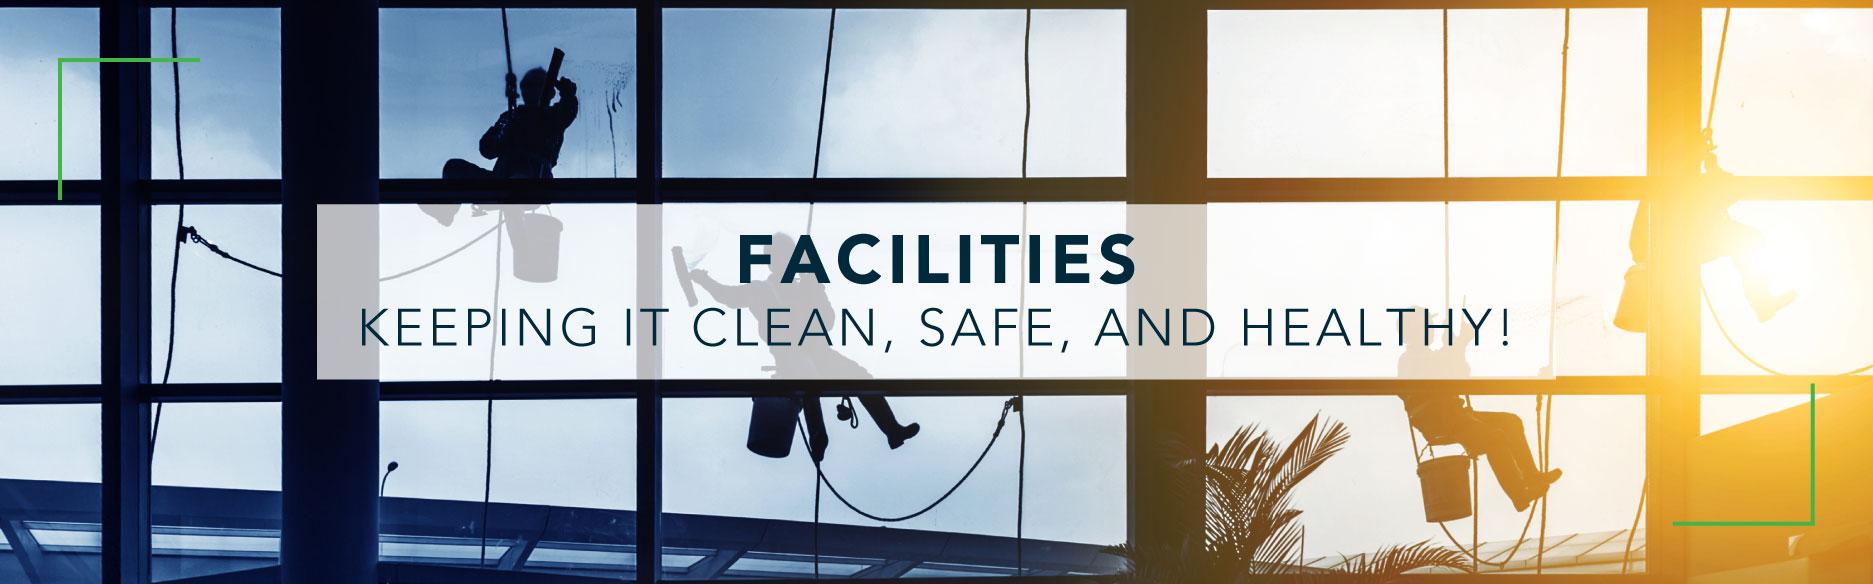 Facilities_banner